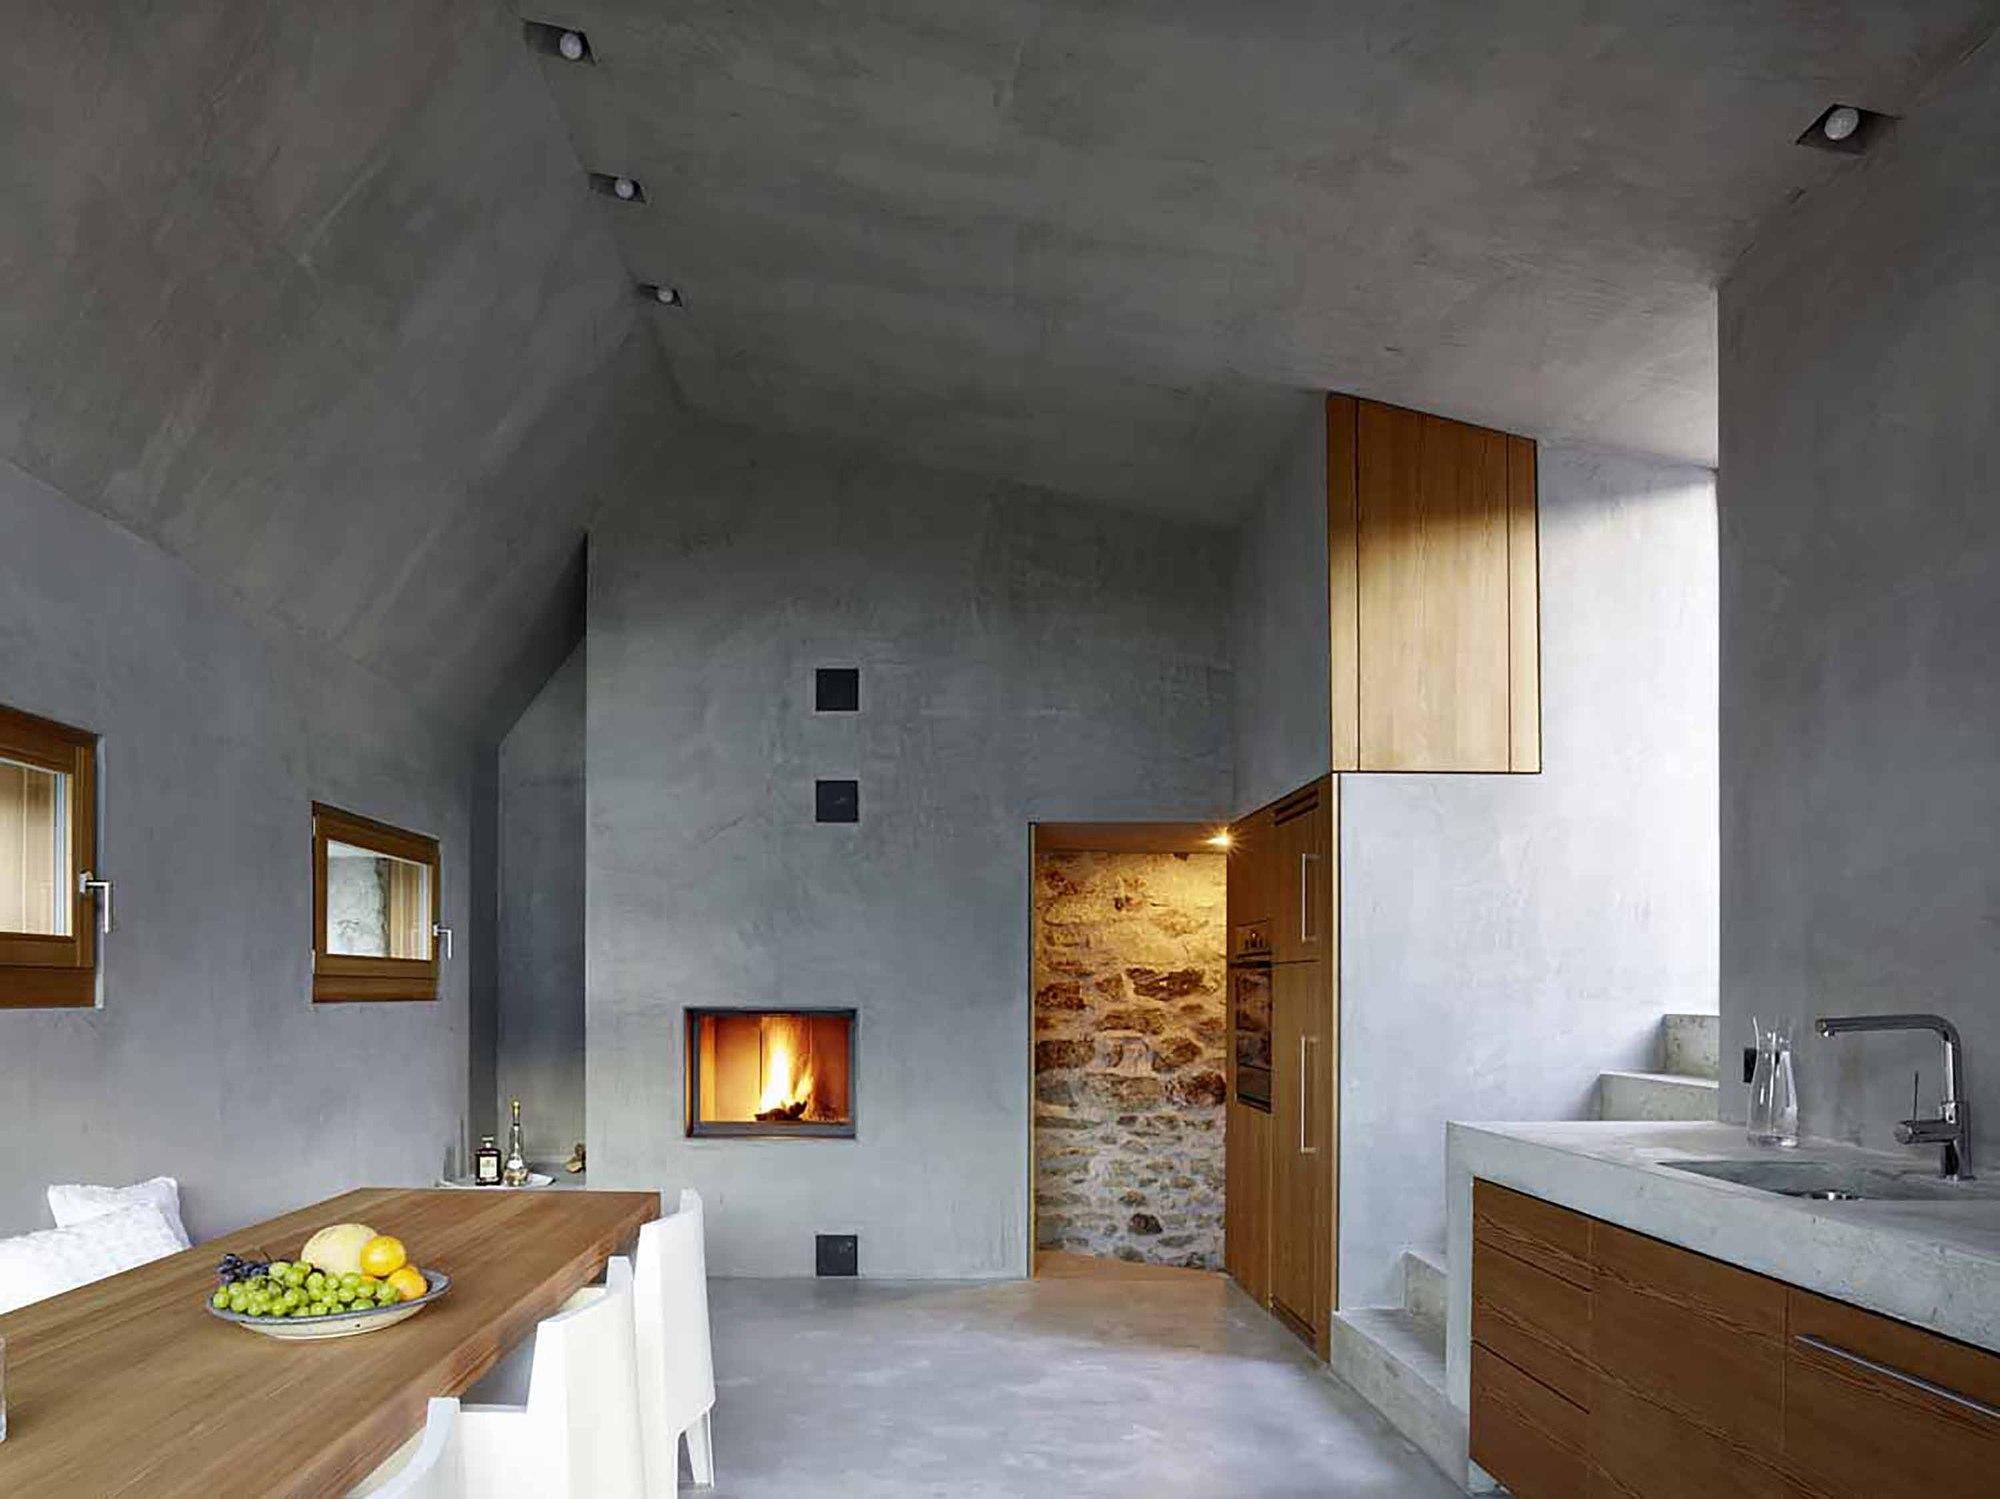 543dd604c07a80762d000250_stone-house-transformation-in-scaiano-wespi-de-meuron-romeo-architects_1430_cf030937.jpg